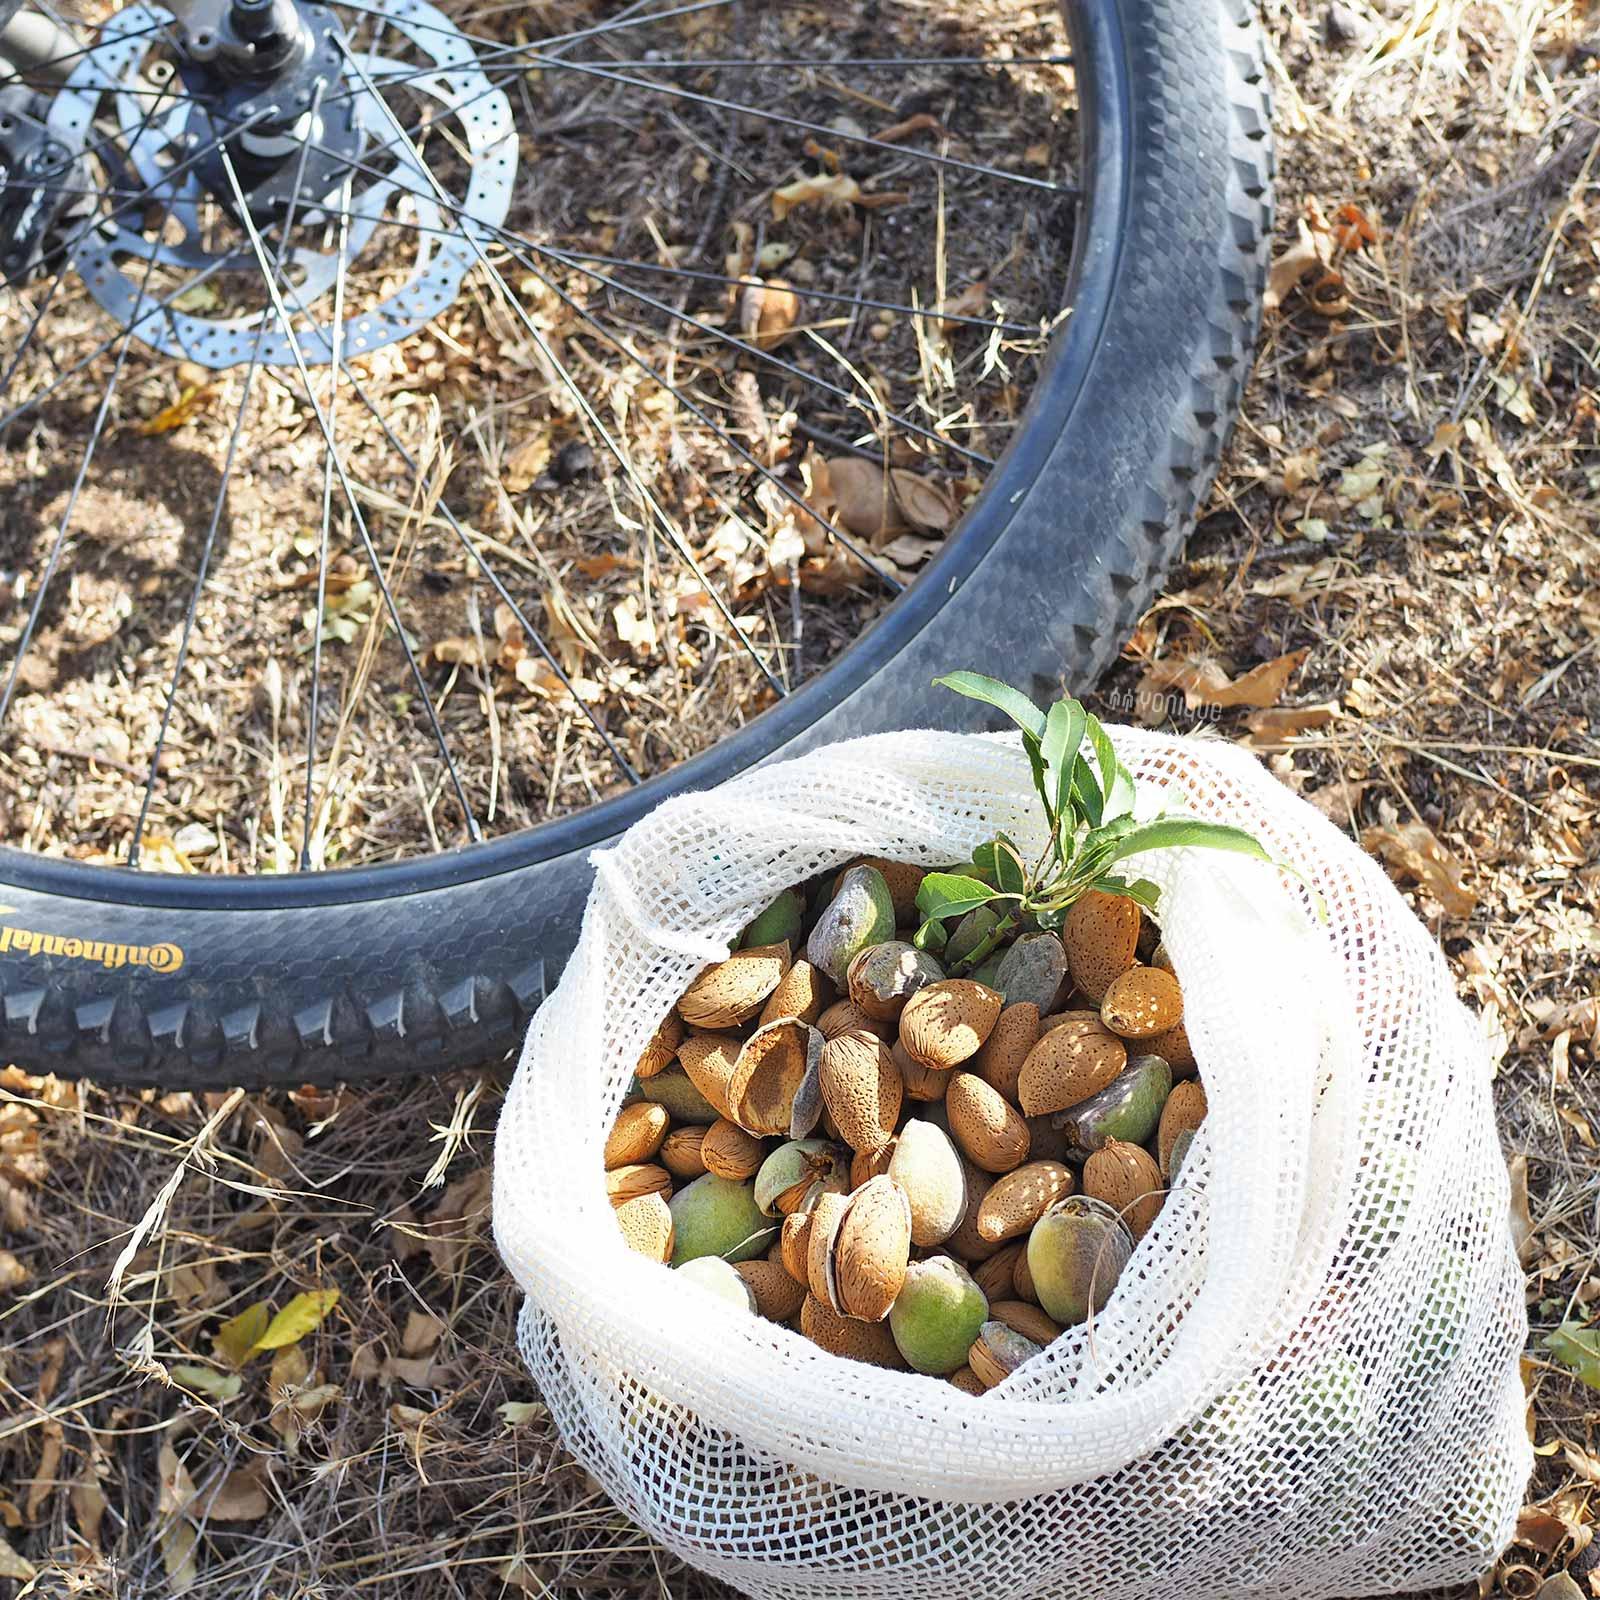 cueillette-amandes-almond-september-castilla-leon-escapade-bici-bike-yoniquenews